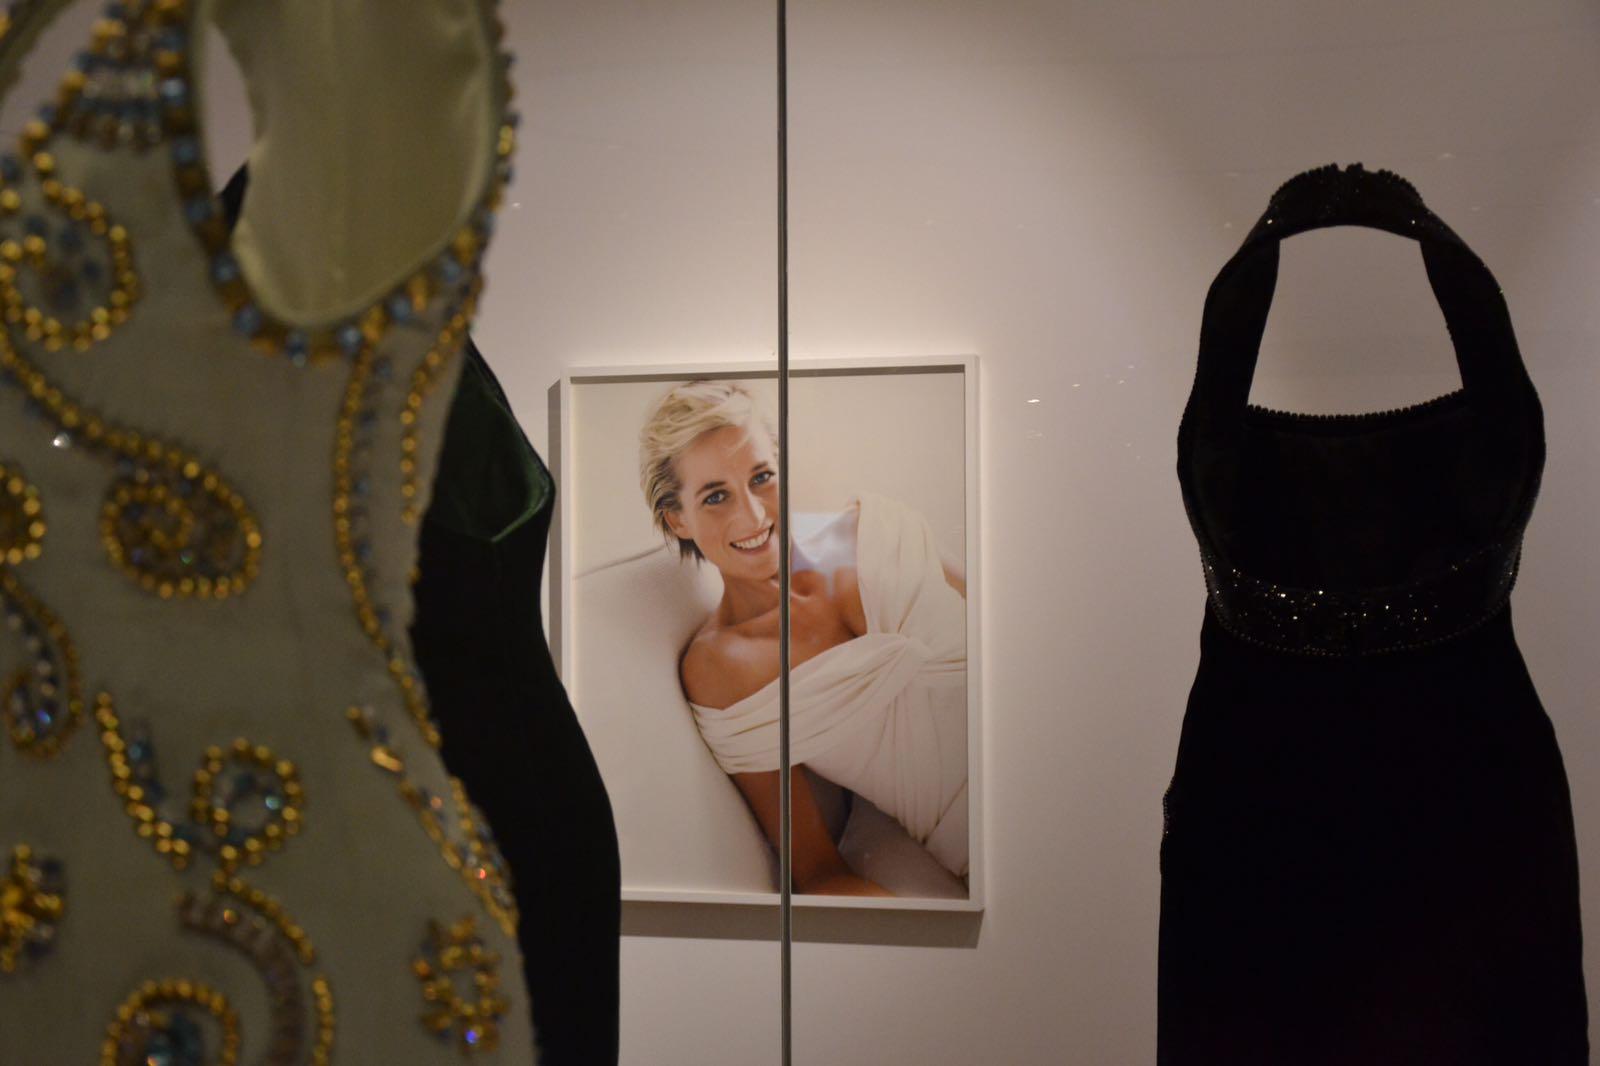 La mostra dei vestiti di Lady Diana a Kensington Palace a Londra.